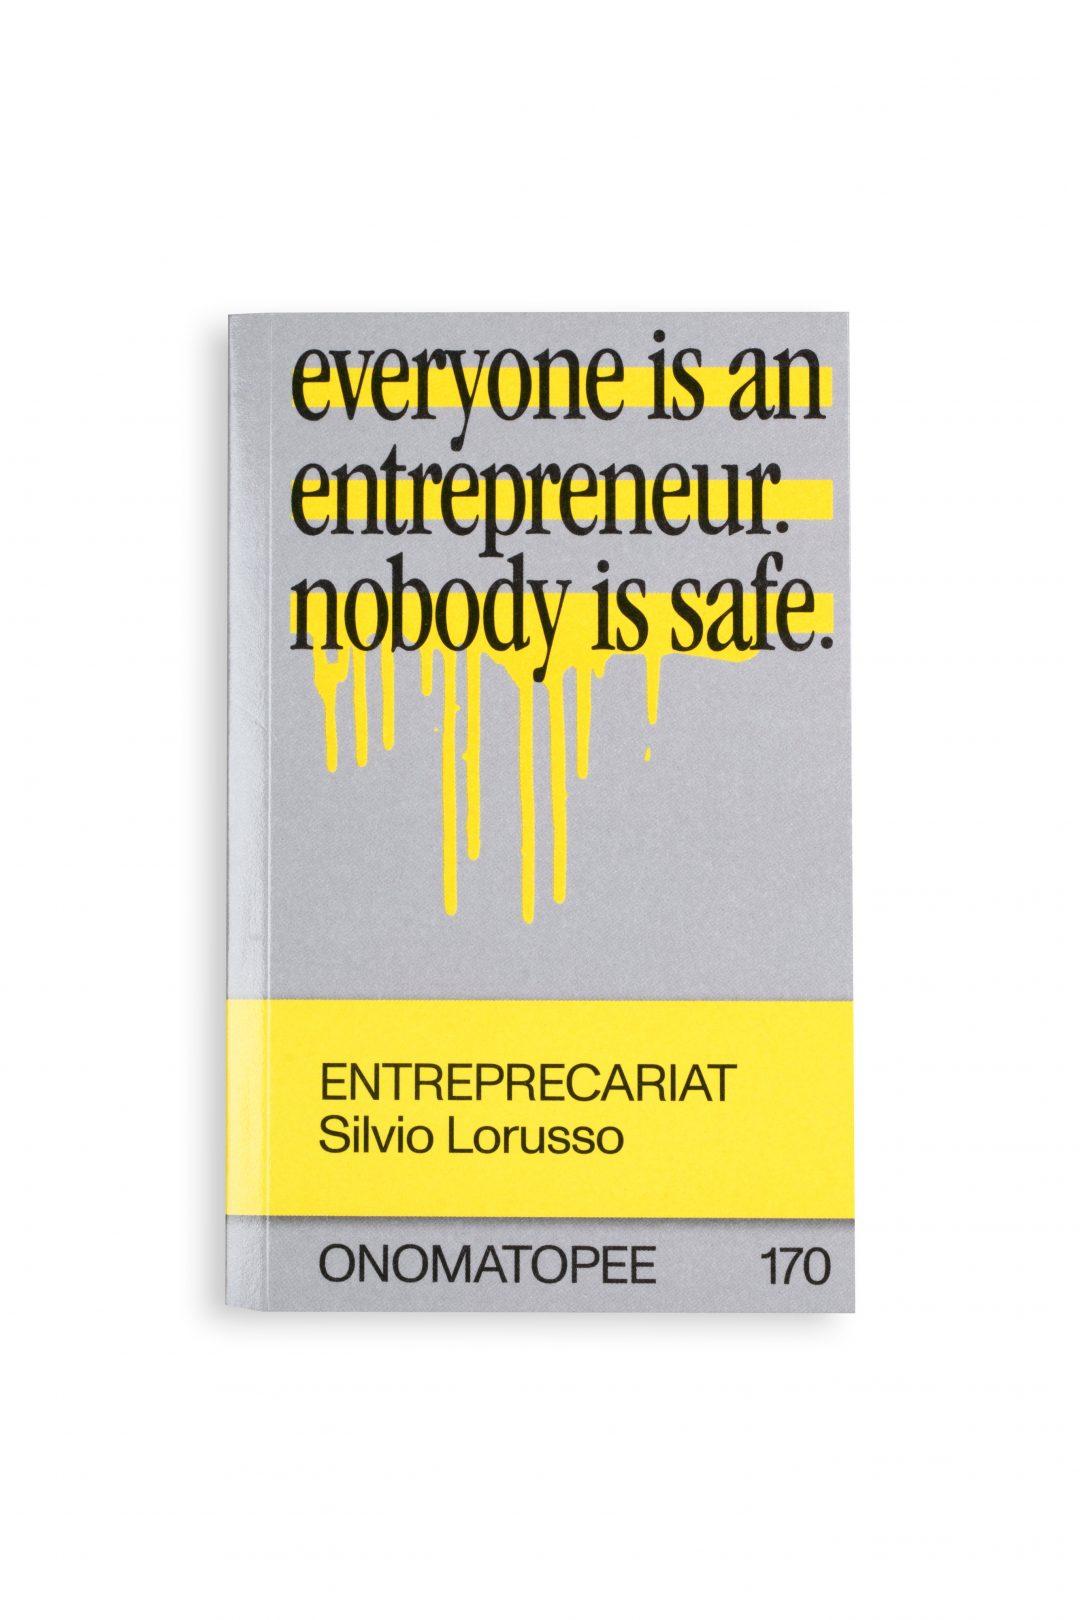 Entreprecariat, Silvio Lorusso, Onomatopee, 2019